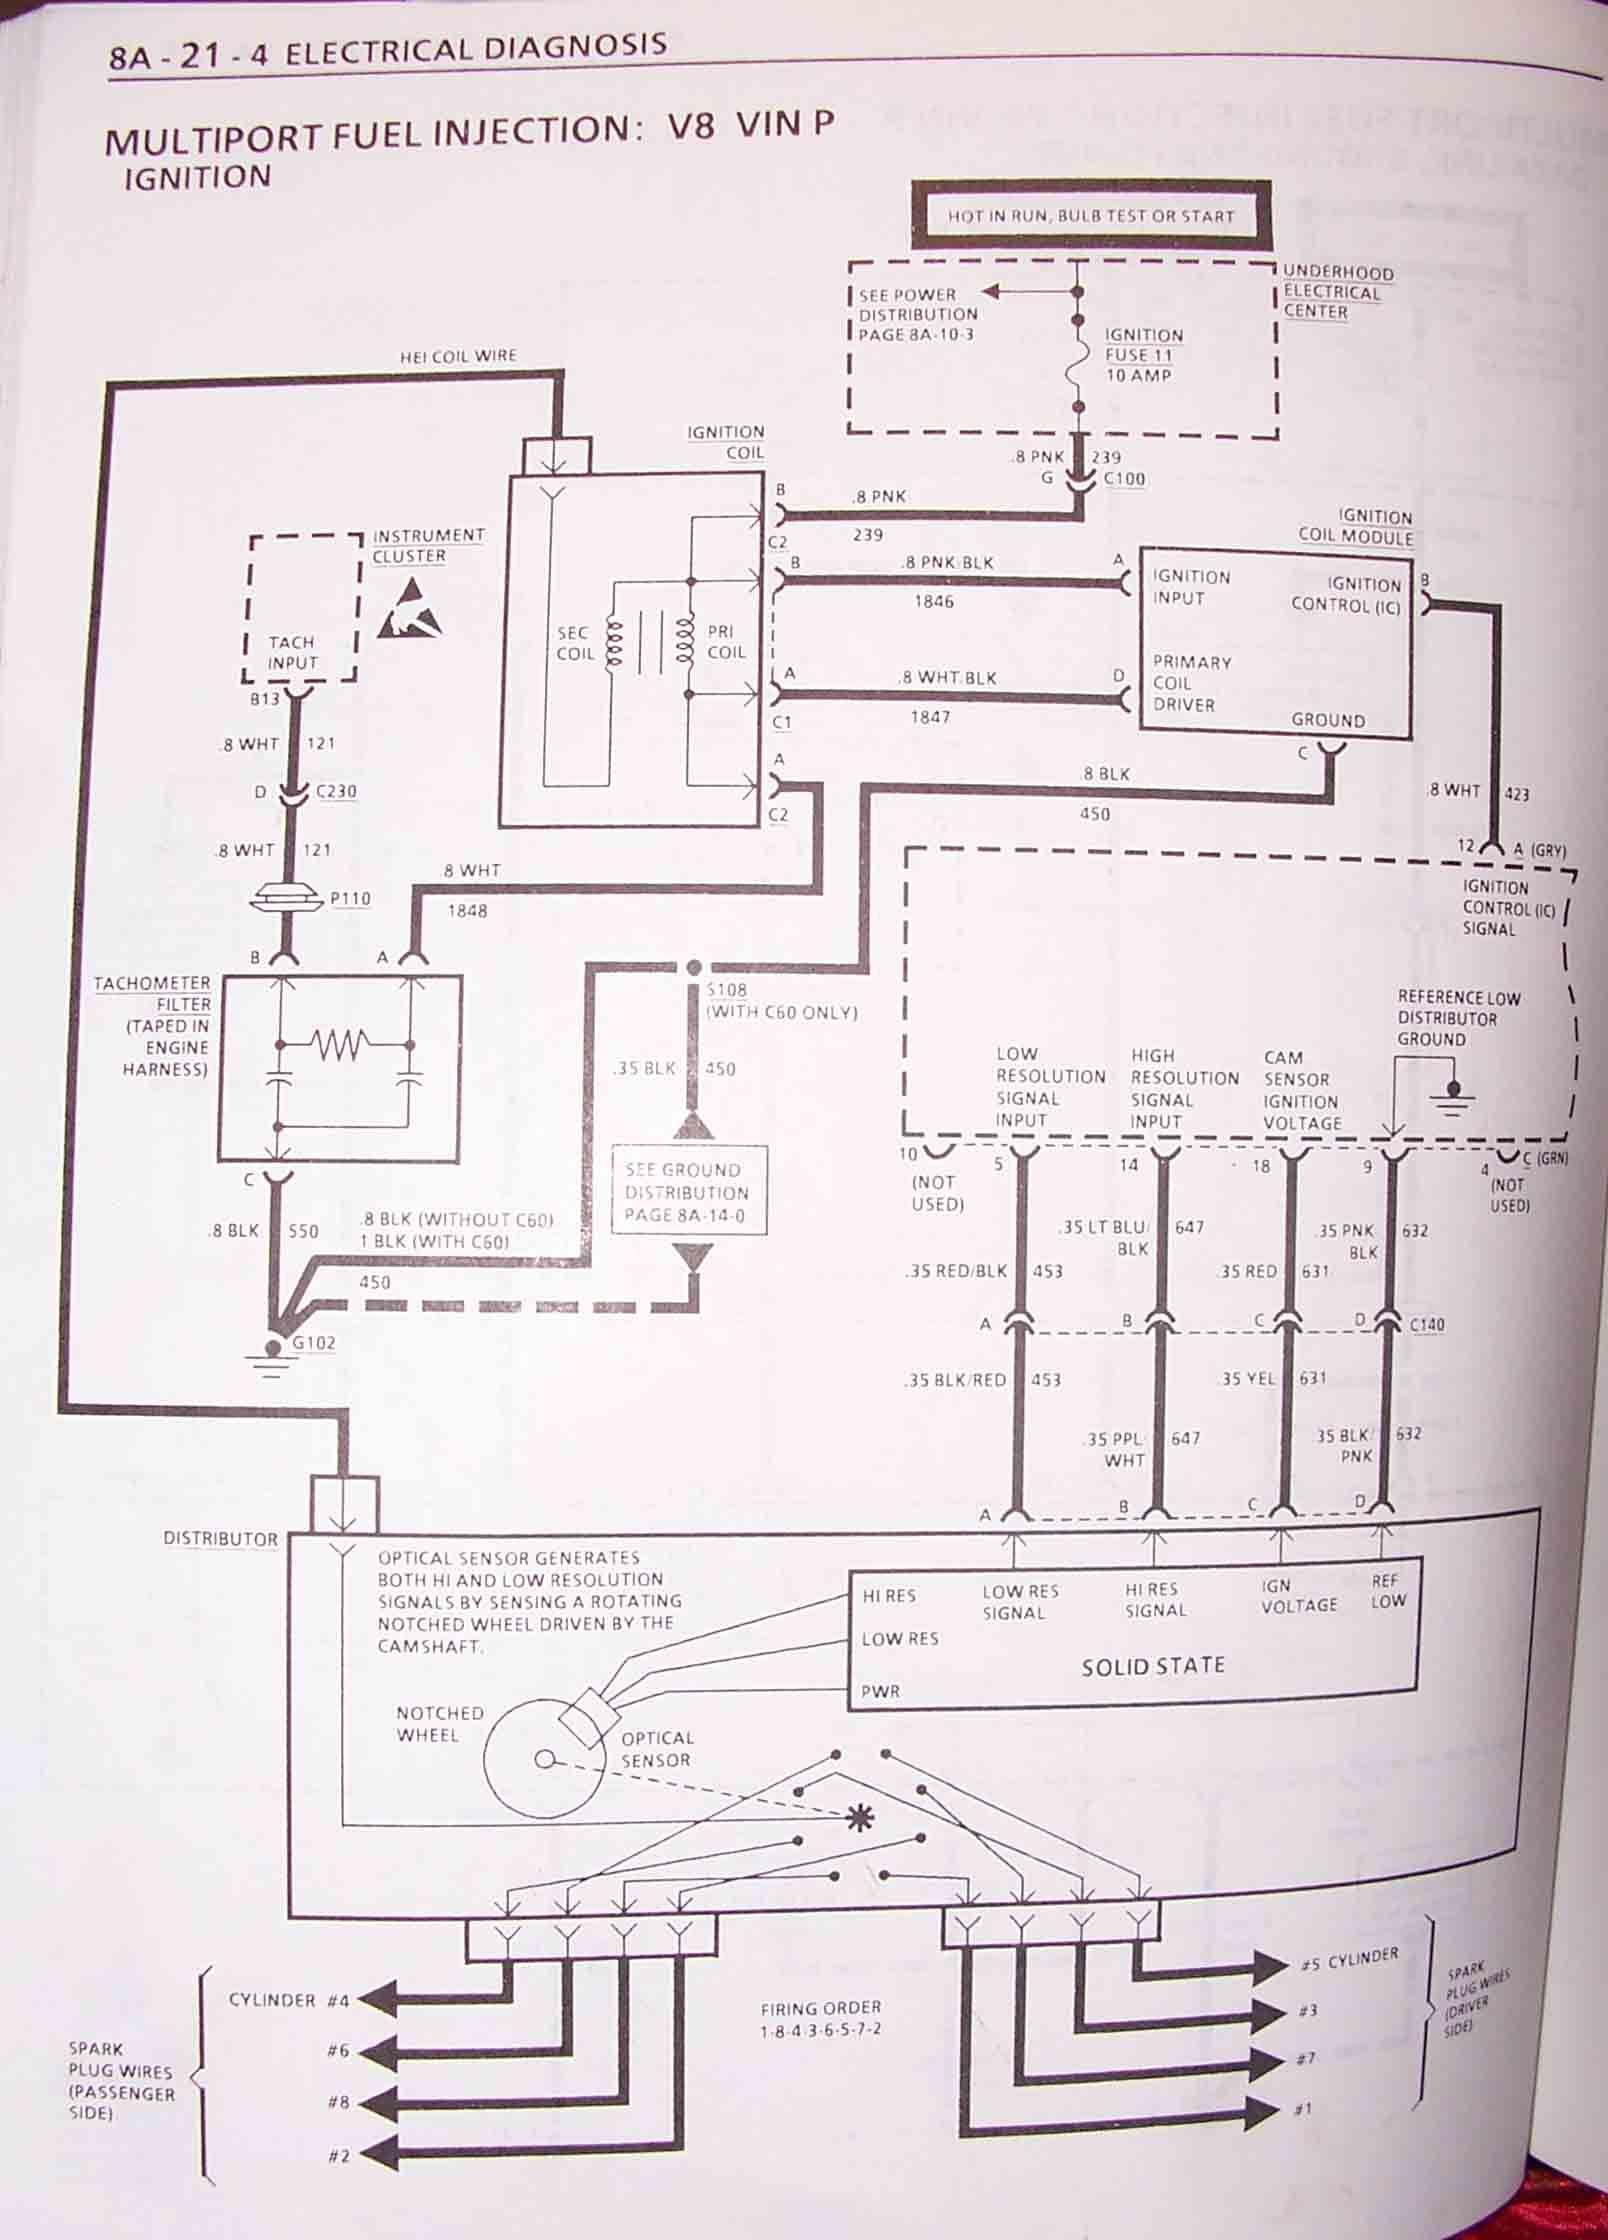 55 Fresh Lt1 Starter Wiring Diagram Electrical Wiring Diagram Trailer Wiring Diagram Electrical Diagram